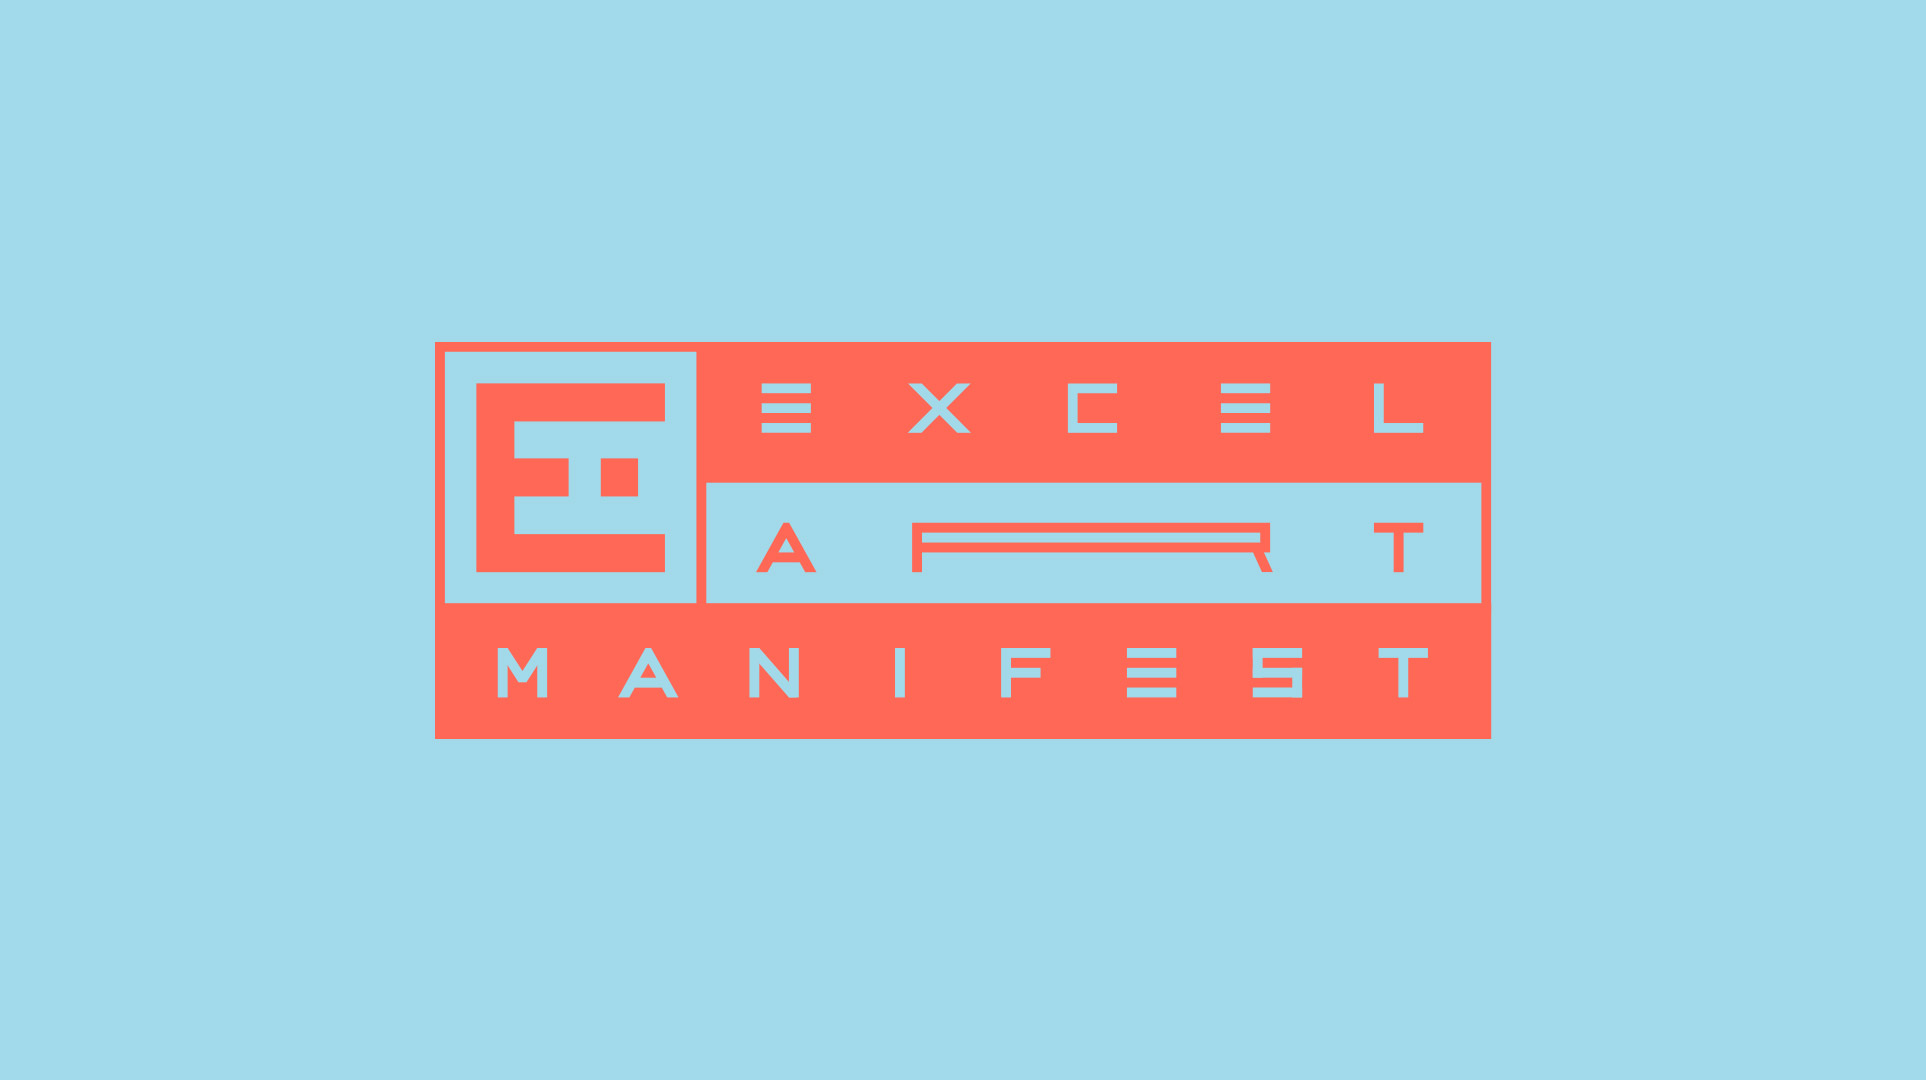 Manifest ExcelArt